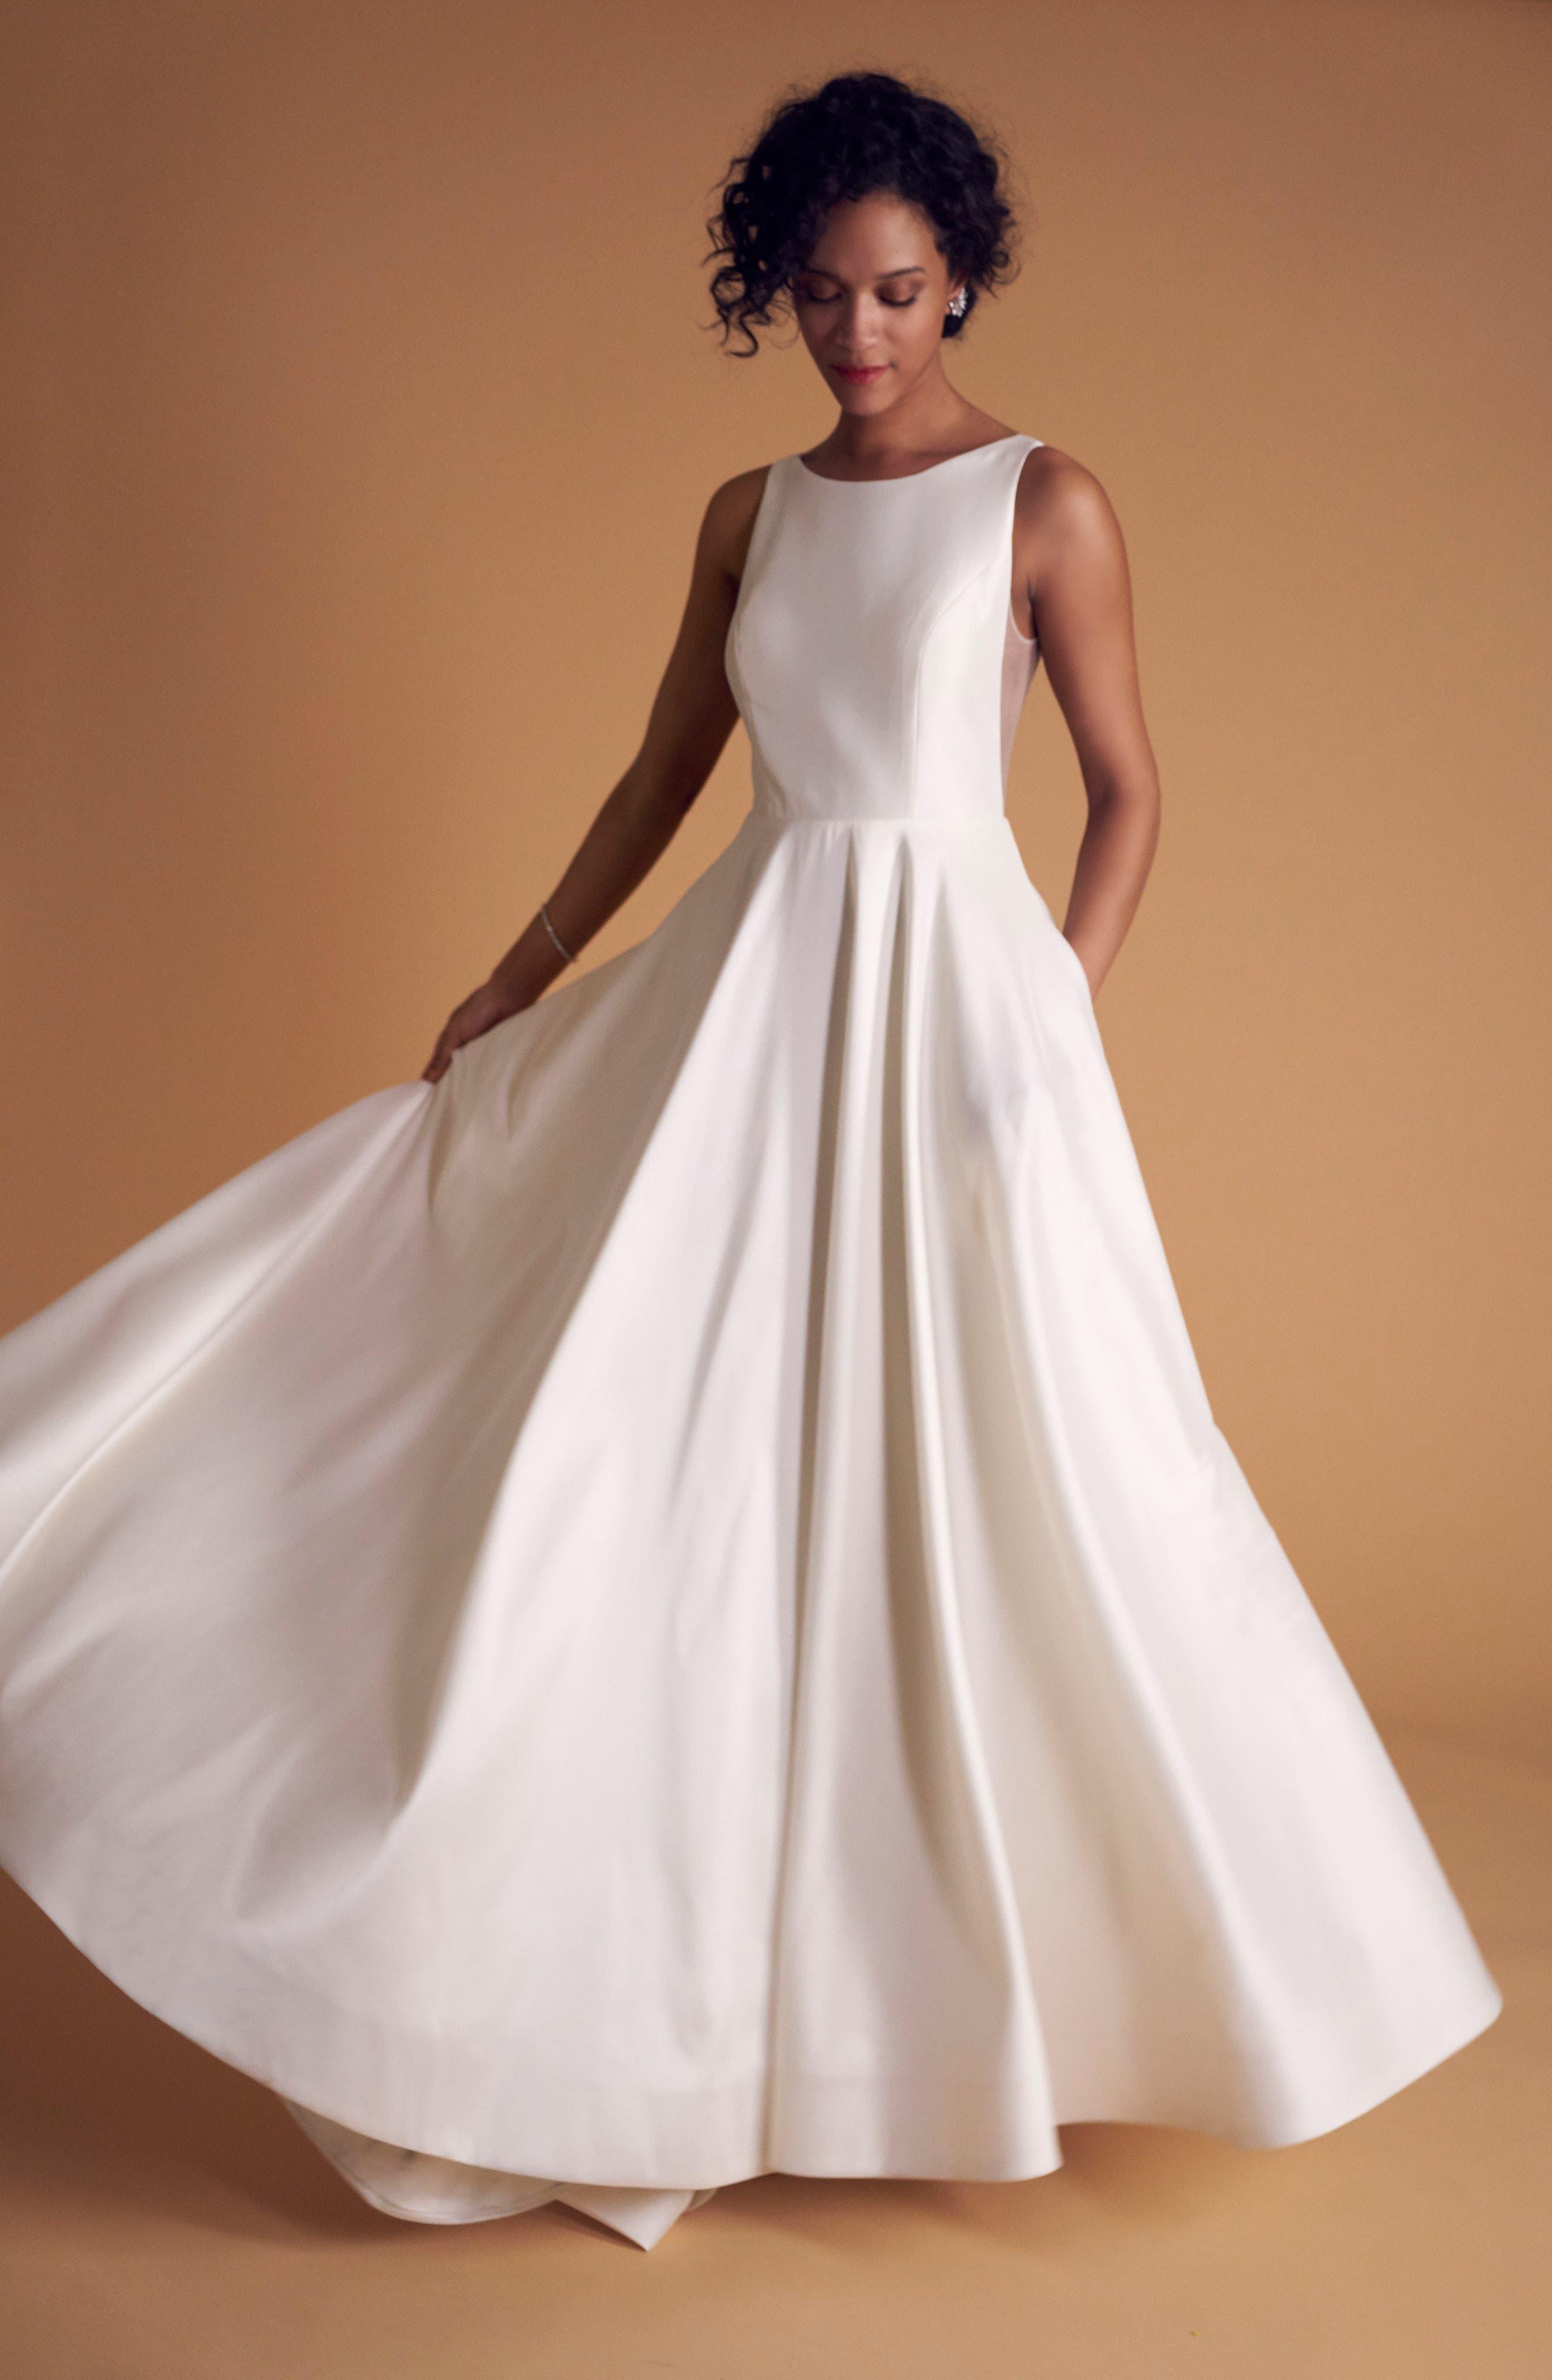 Ashton Plunge Back A-Line Gown,                             Alternate thumbnail 4, color,                             IVORY